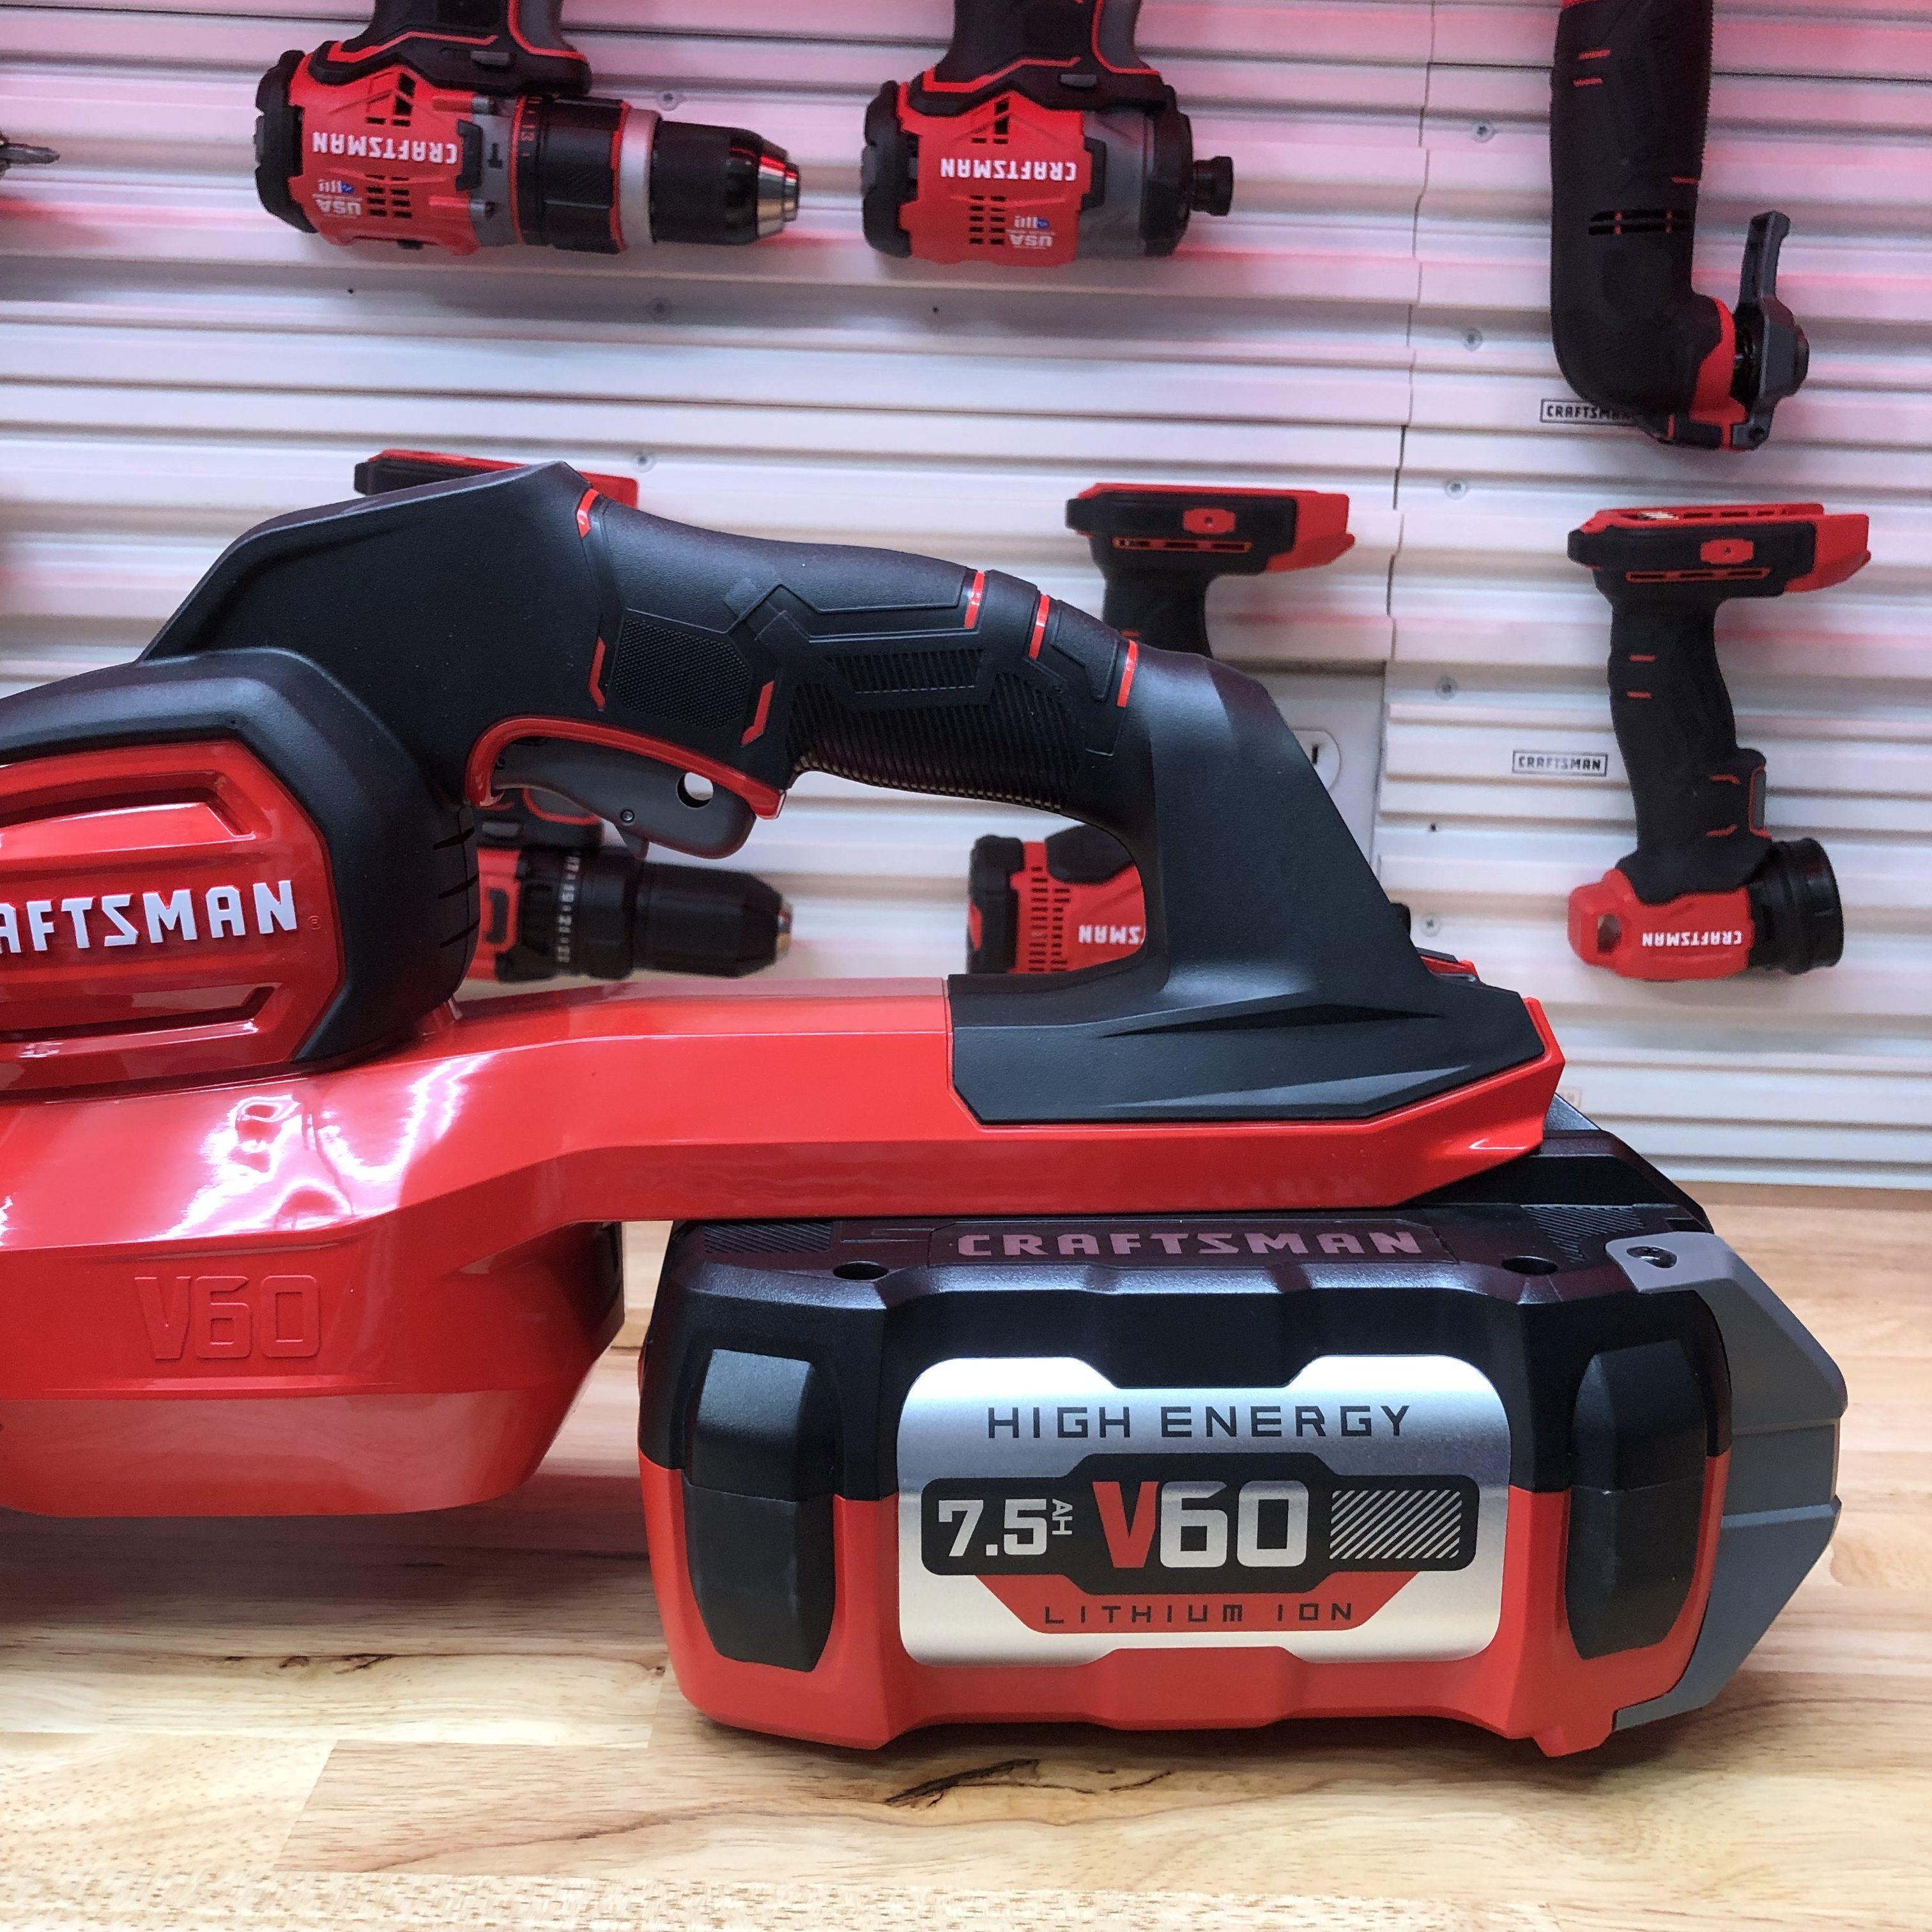 Tool Talk 010 Craftsman V60 Cordless Lawn Mower Chris Duke